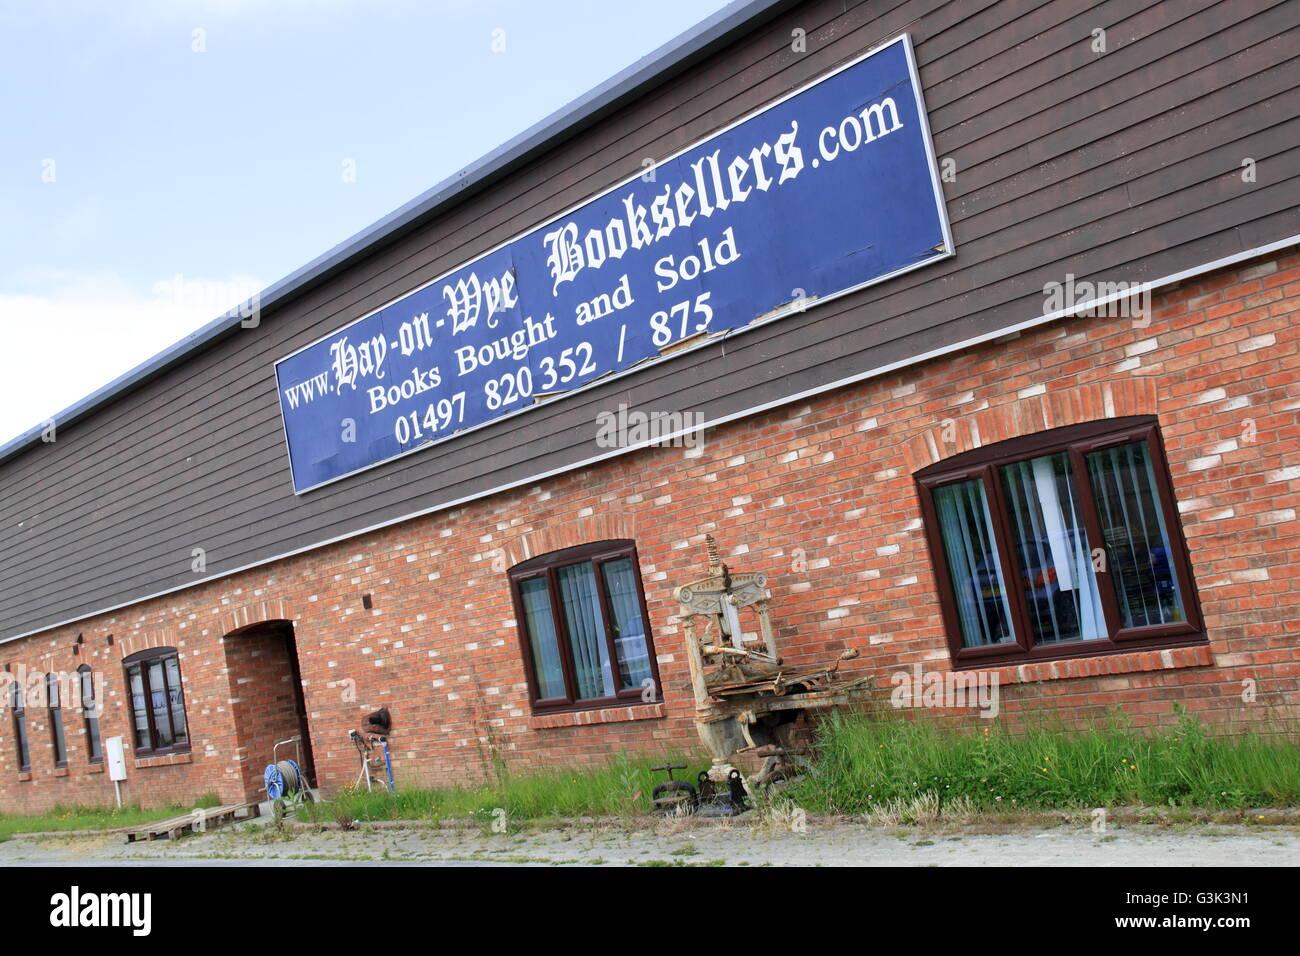 Hay-on-Wye Booksellers online bookshop, Gipsy Castle Lane